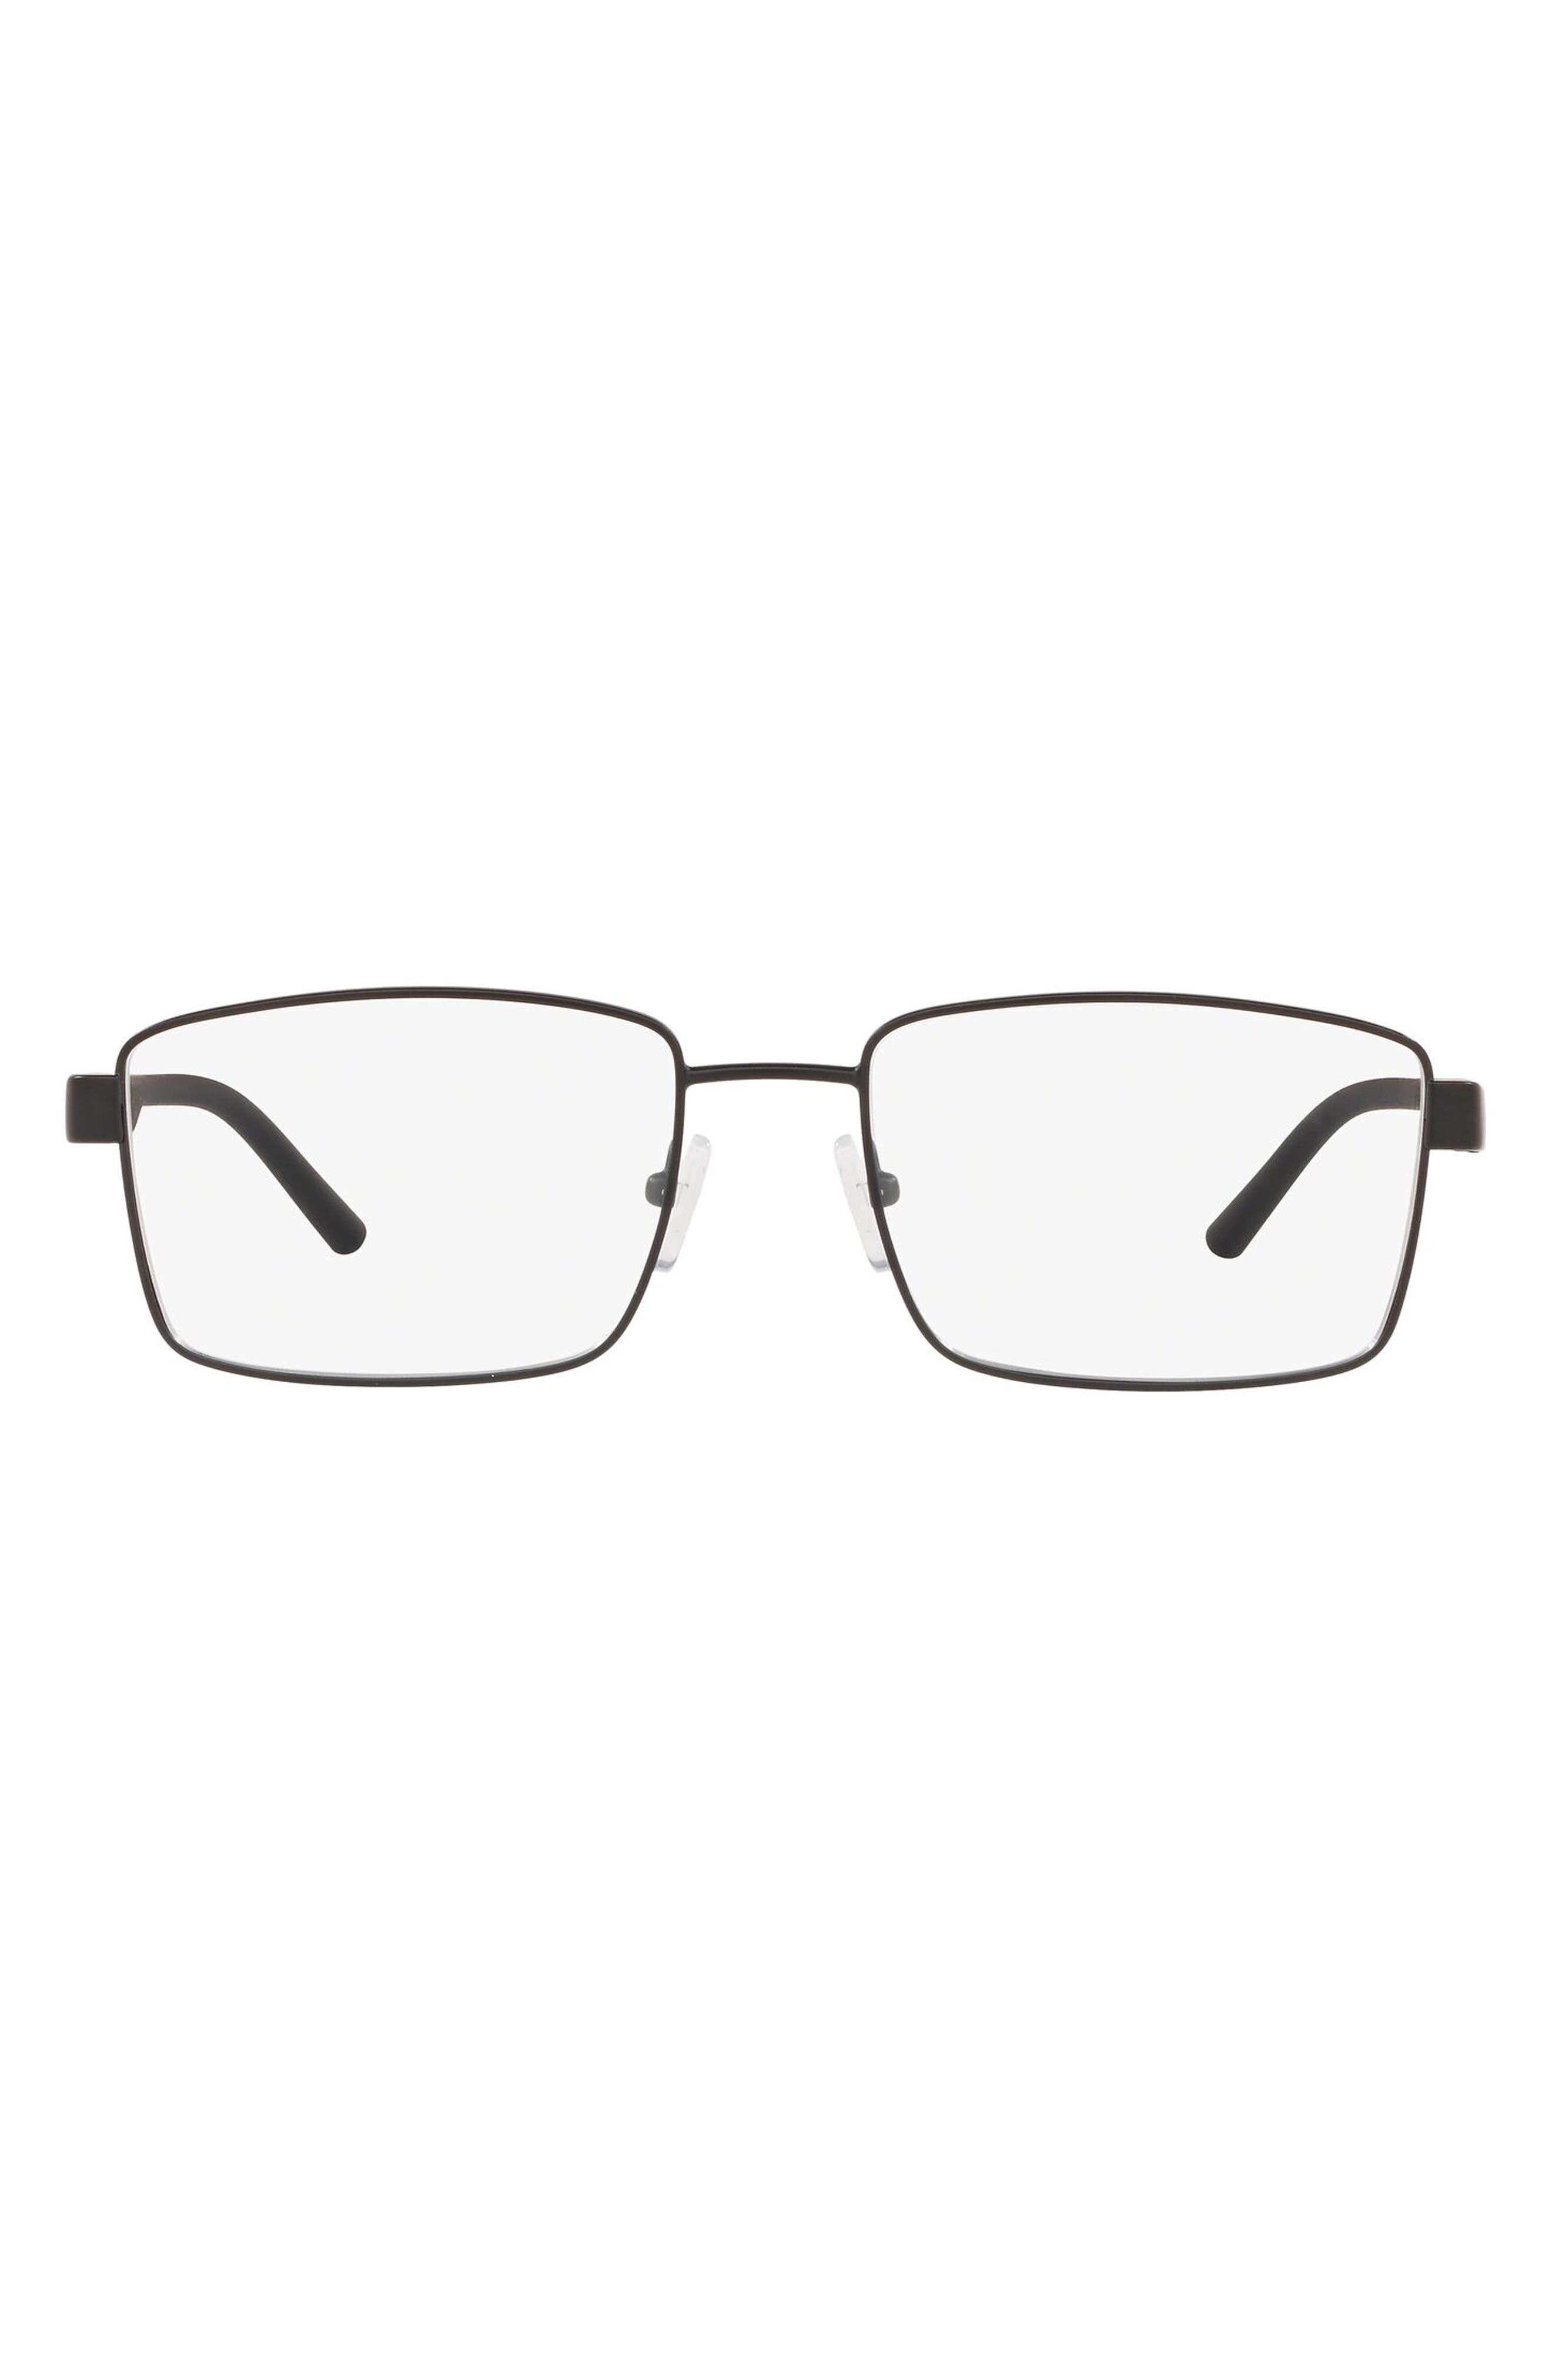 55mm Square Optical Glasses